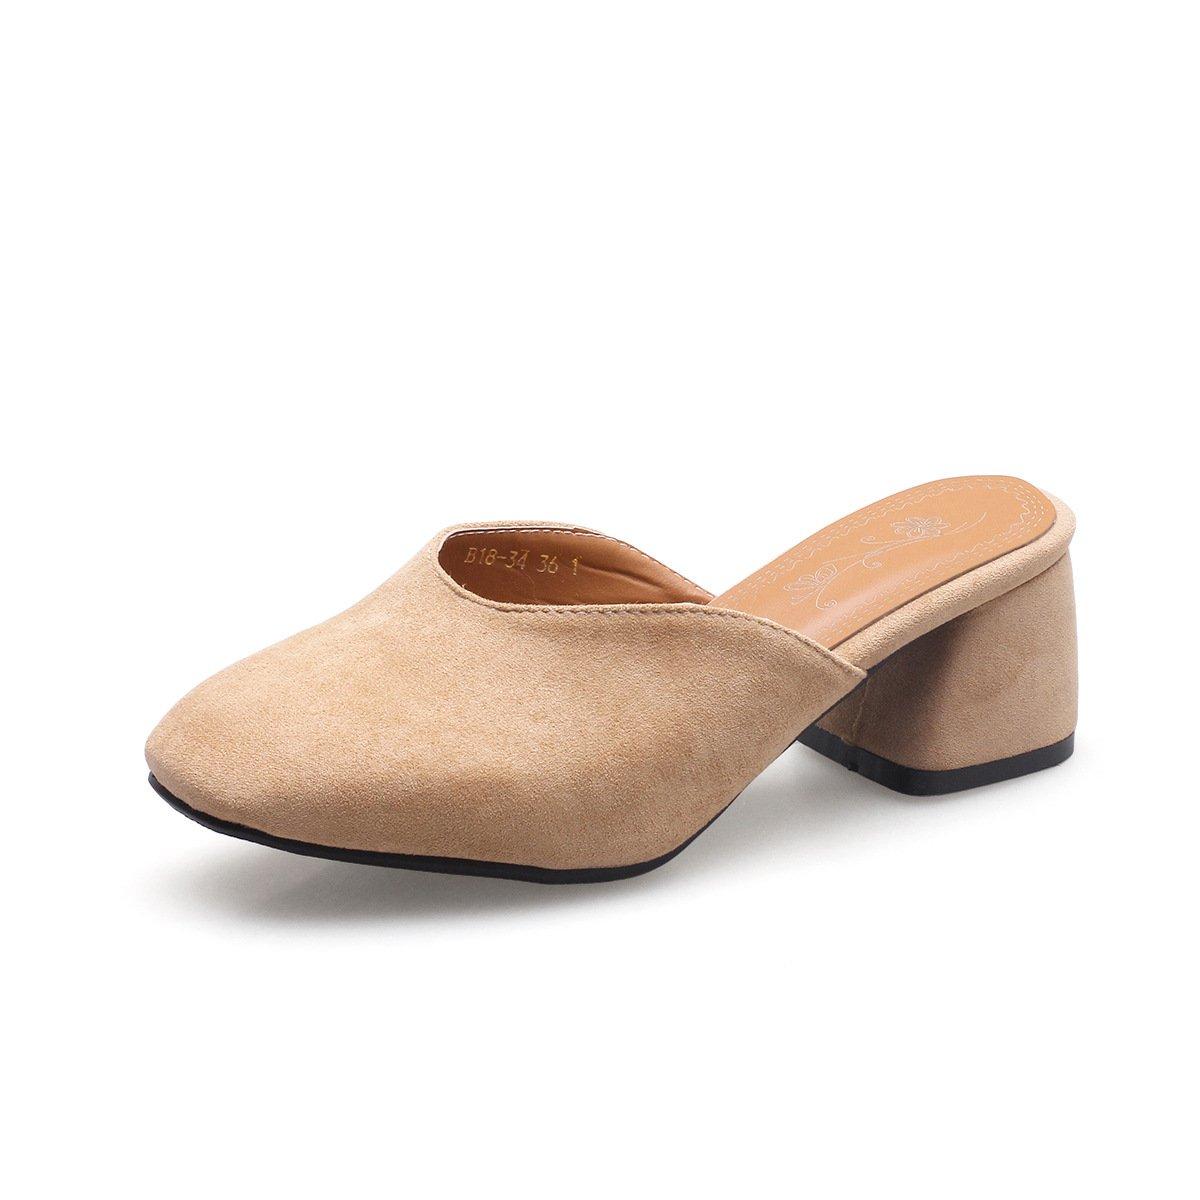 MEI&S Damen Square Sandalen Toe Block Heels Sandalen Square Flip Flop Apricot d58aa9